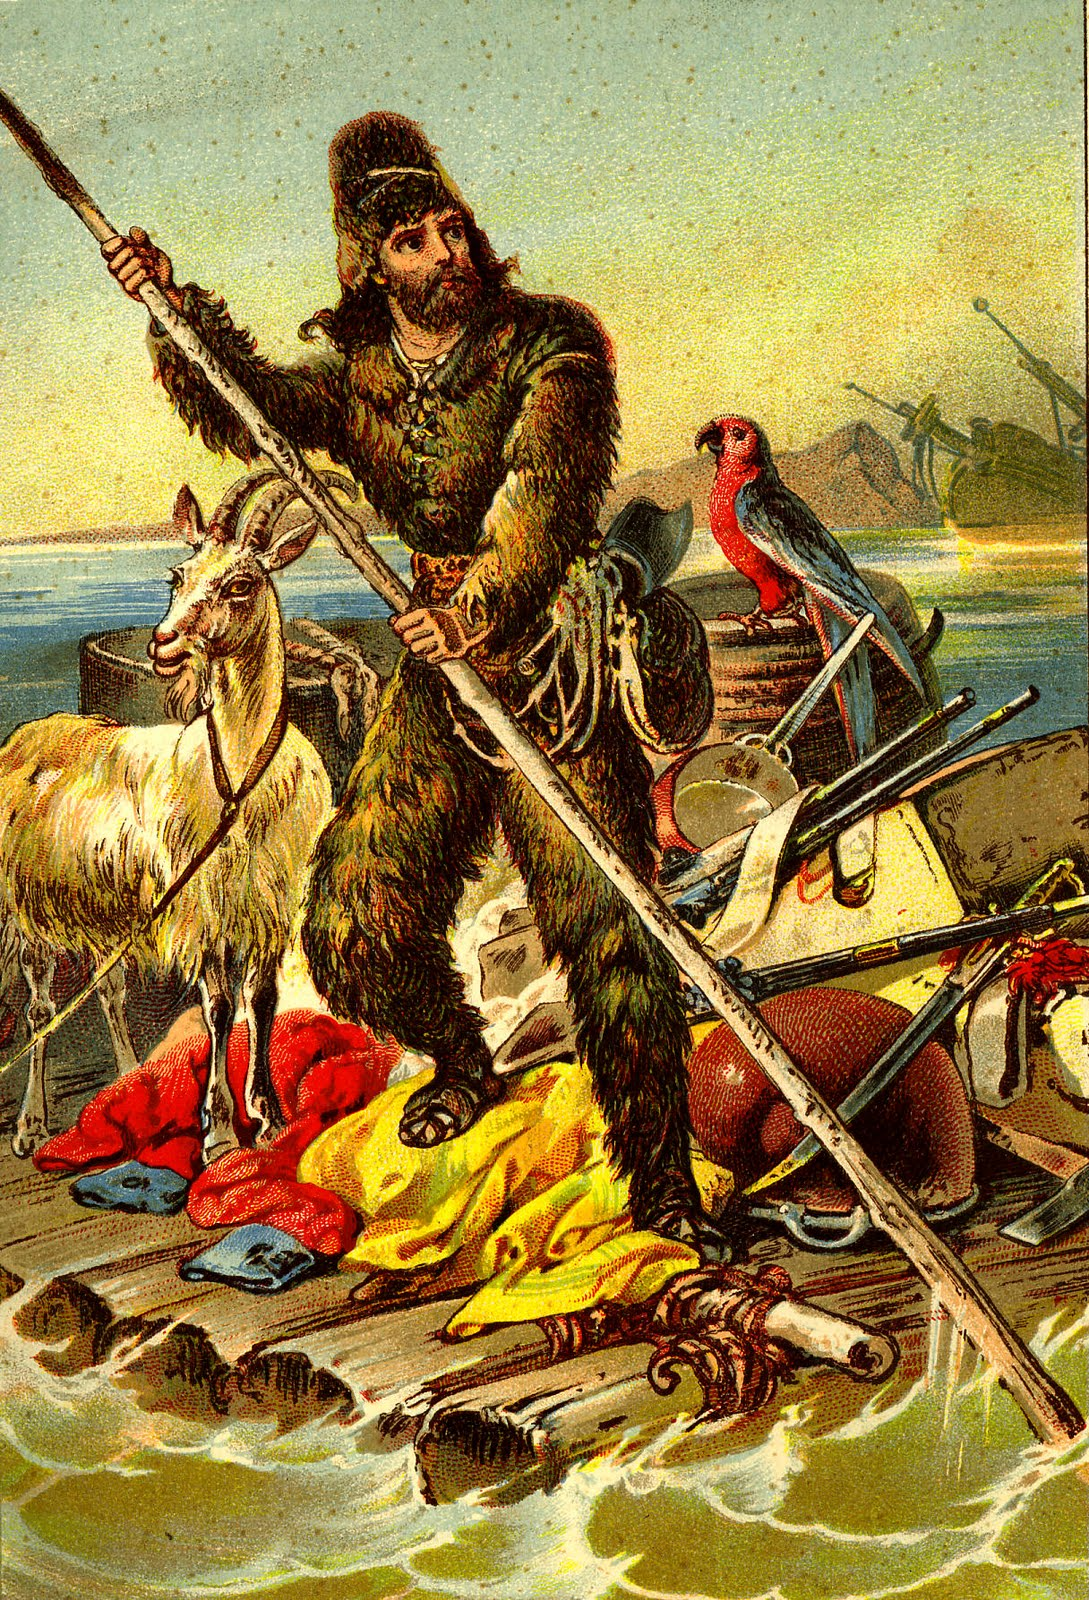 Images: Robinson Crusoe.